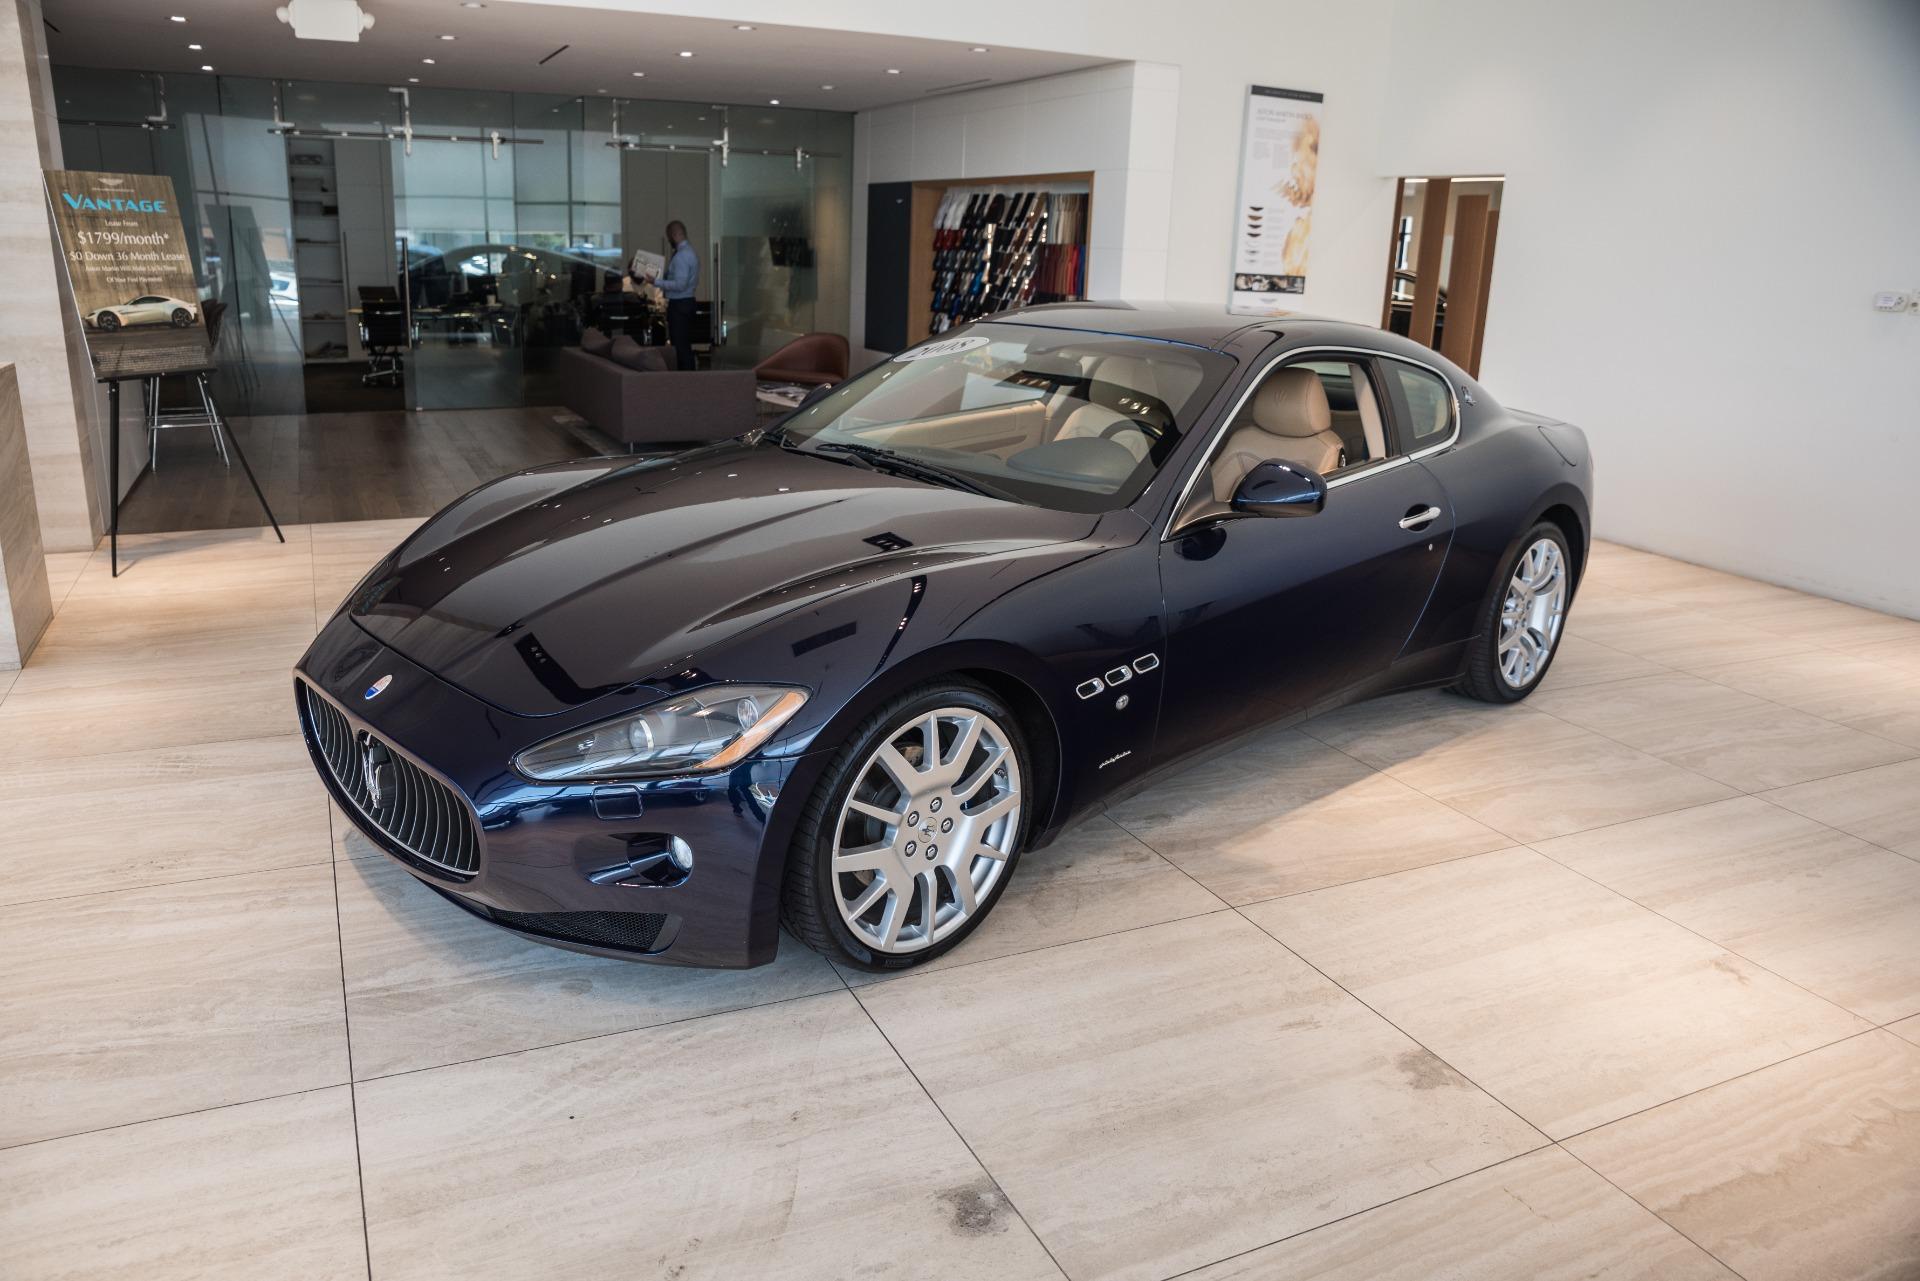 2008 Maserati GranTurismo Stock # P136296B for sale near Vienna, VA   VA Maserati Dealer